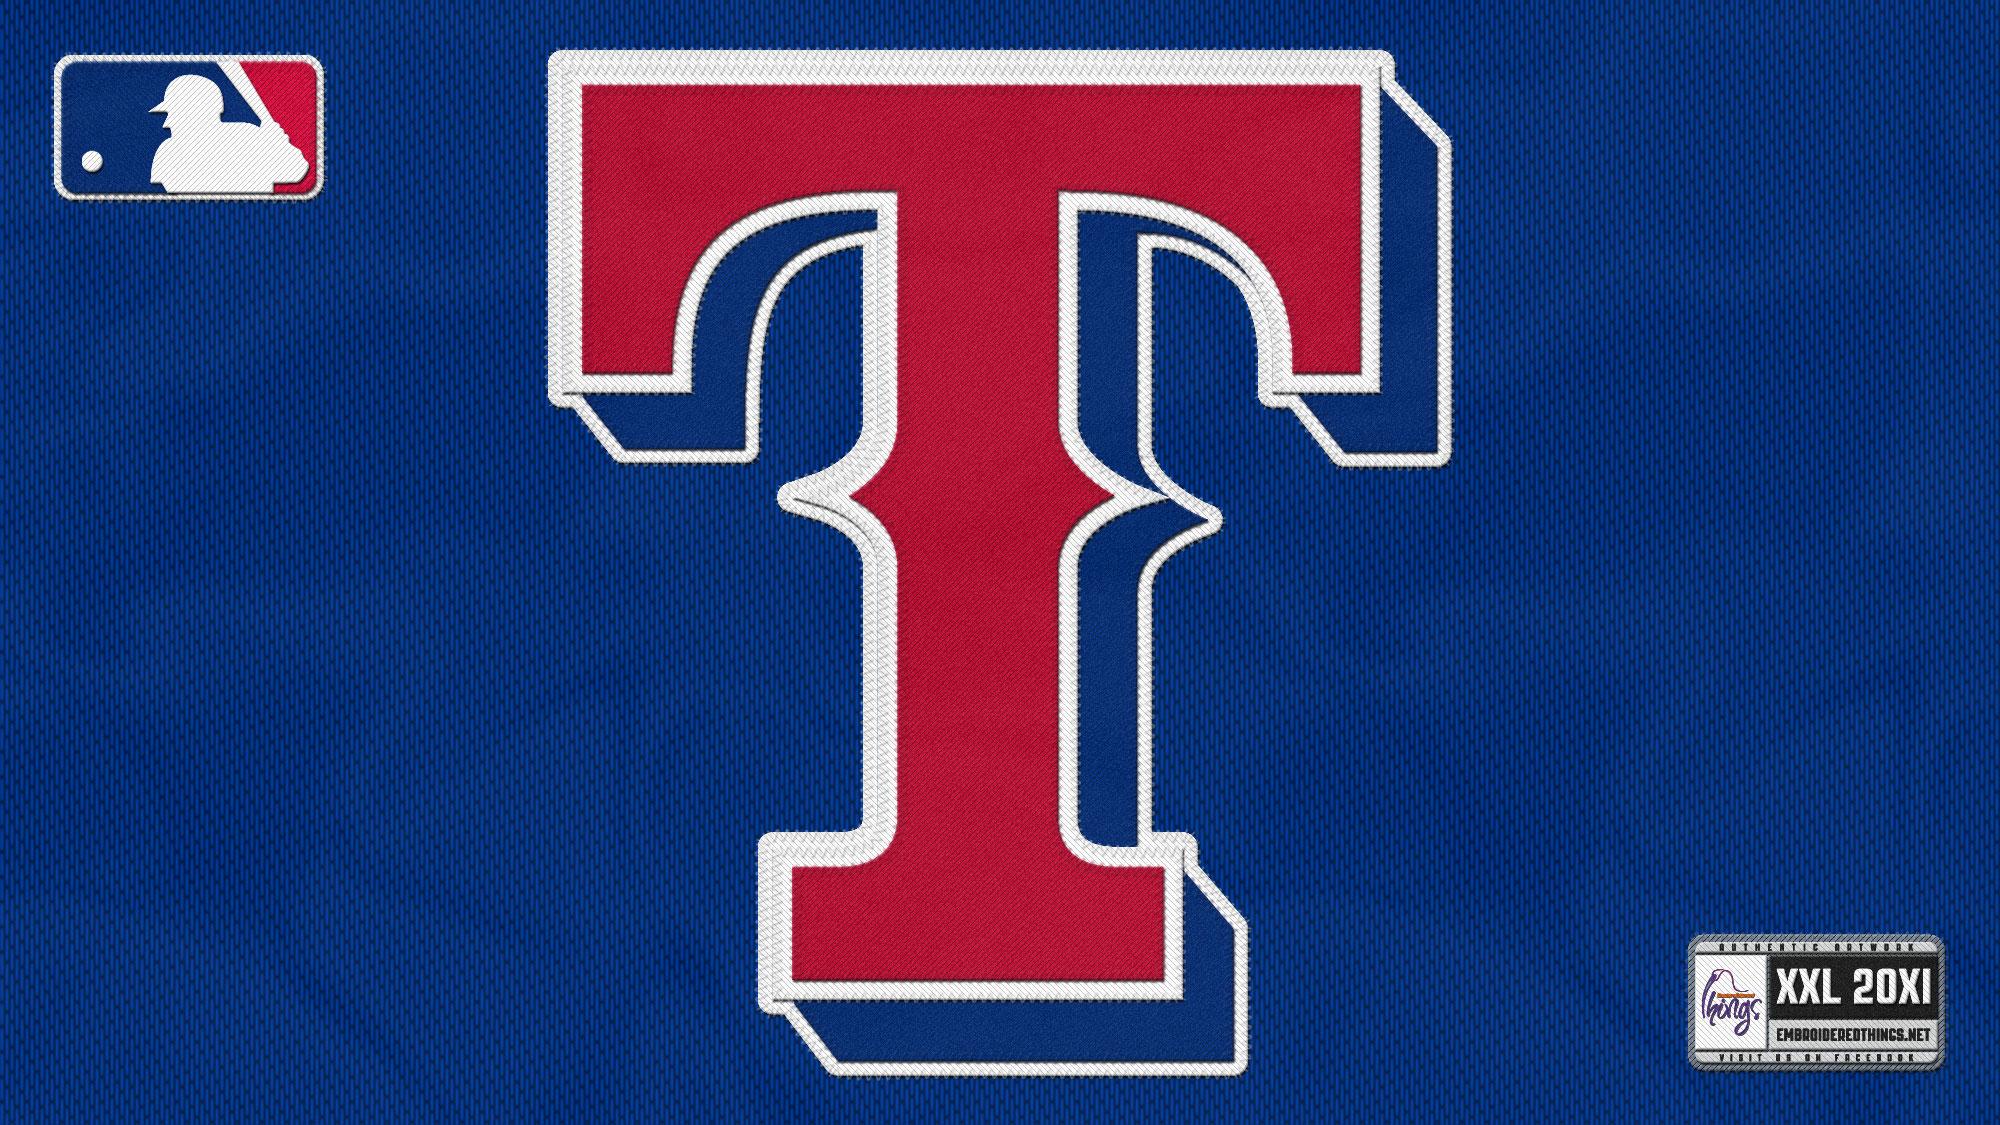 Texas Rangers 2000x1125